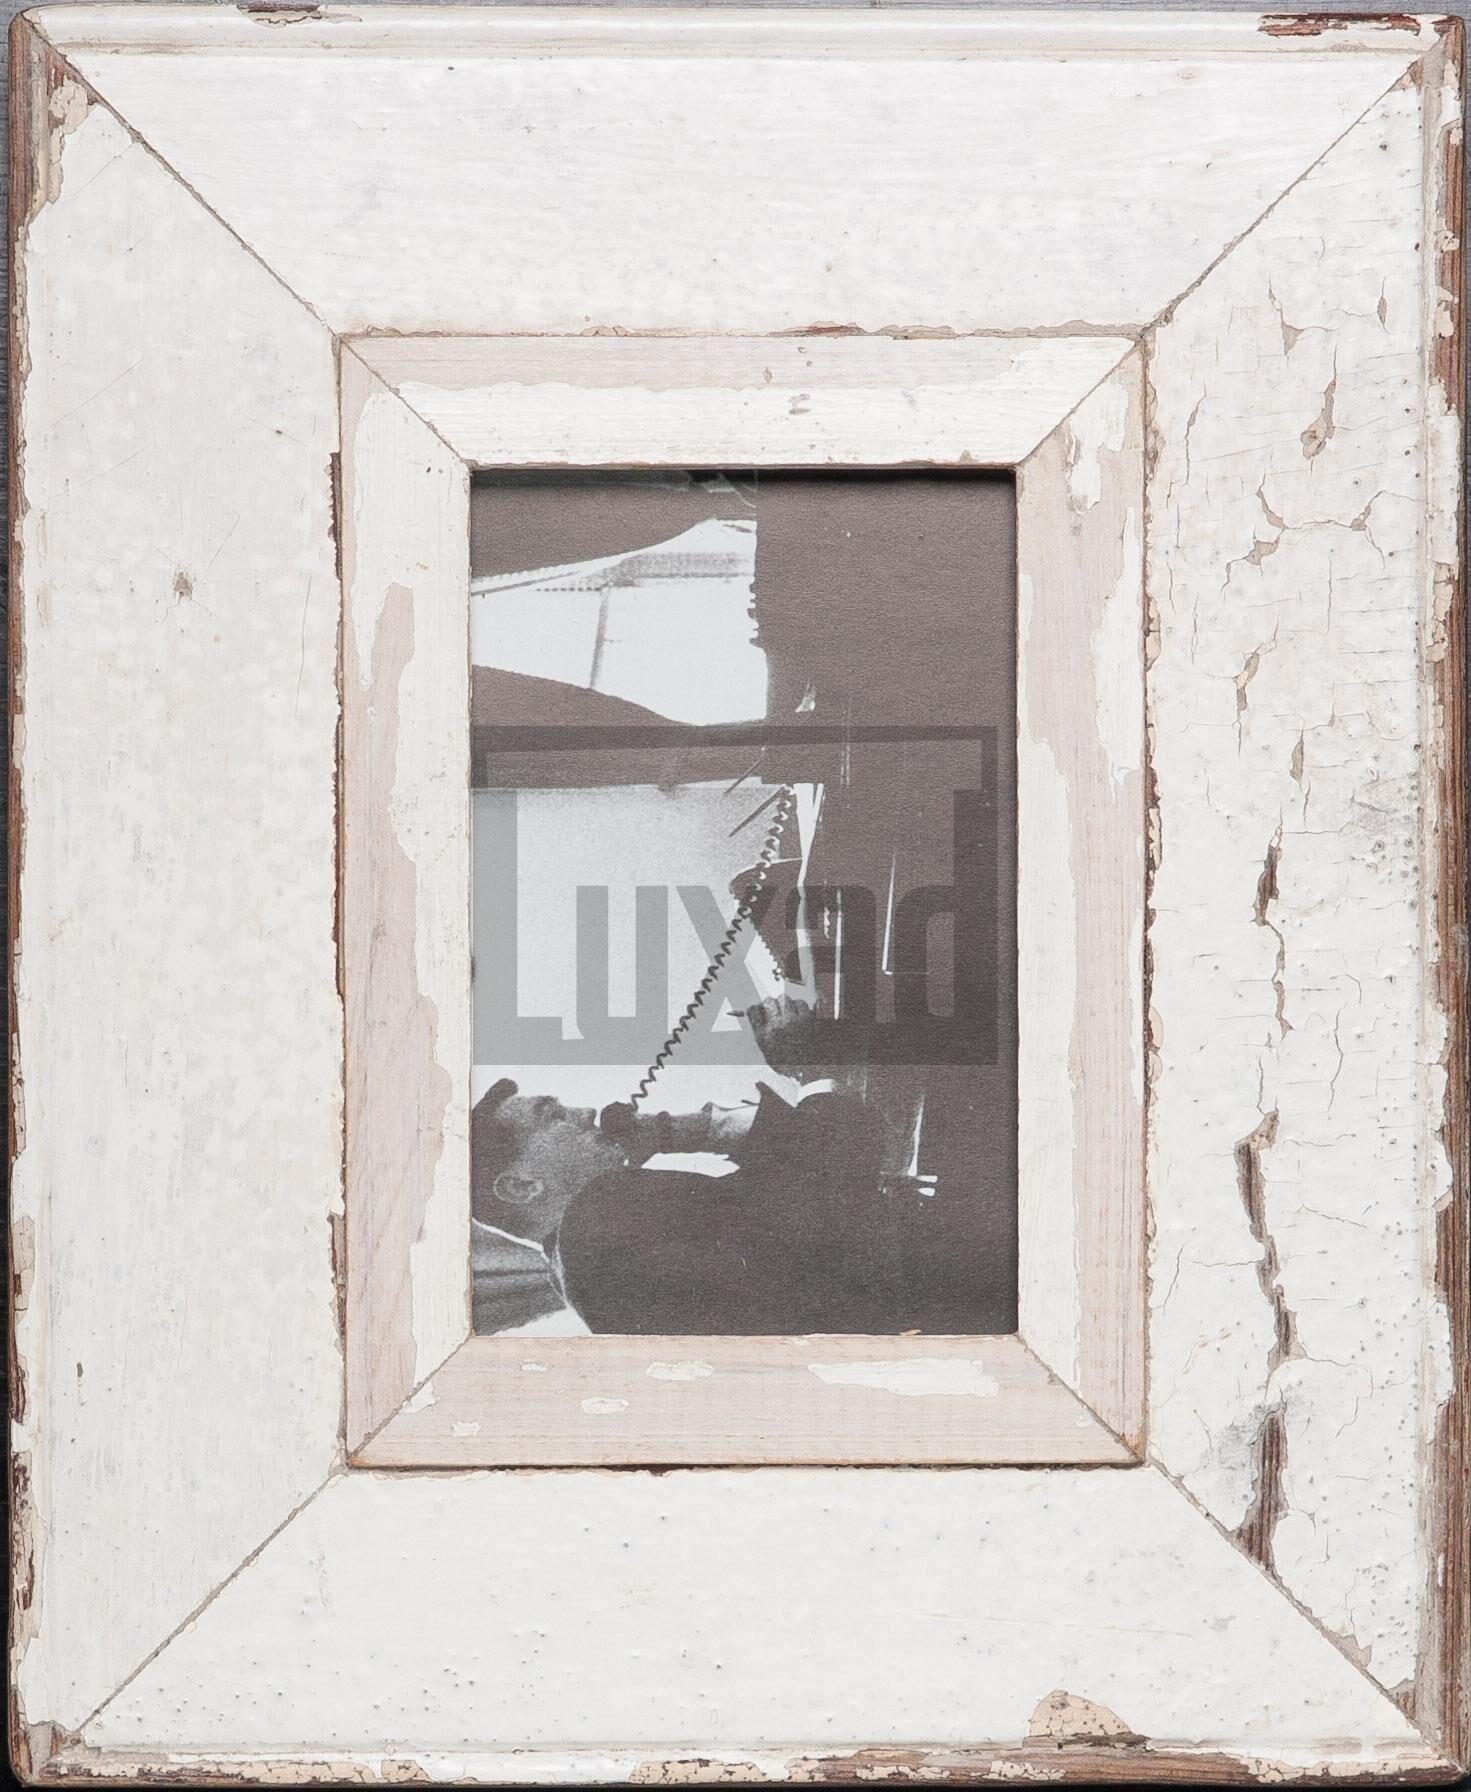 Vintage-Fotorahmen aus recyceltem Holz für Fotos DIN A6